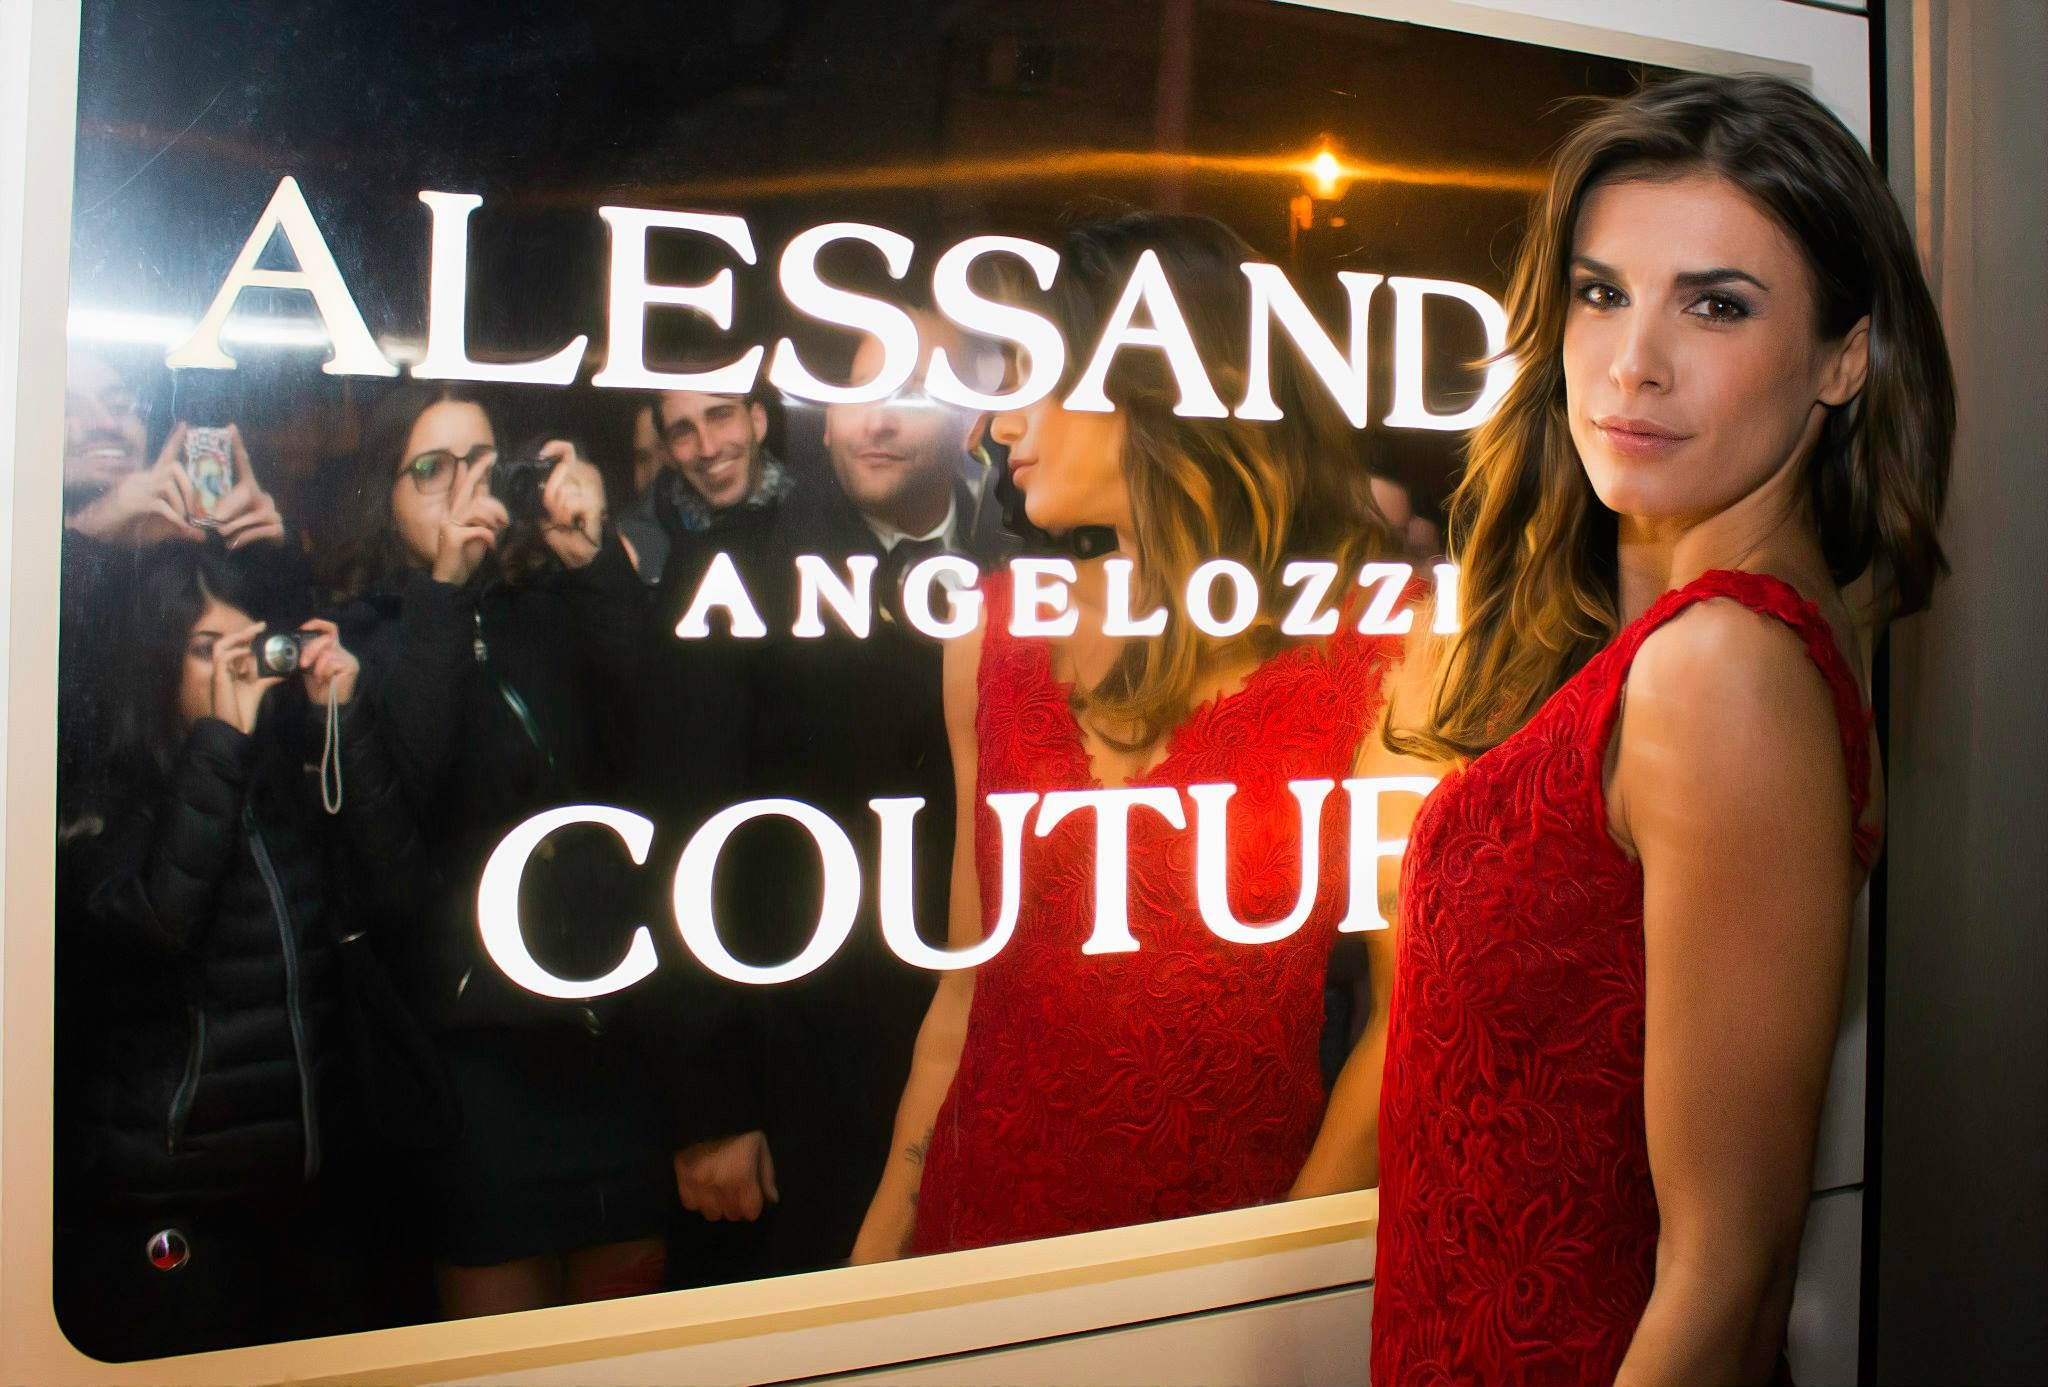 #elisabettacanalis for #alessandroangelozzicouture #elisabettacanalisweddingdress